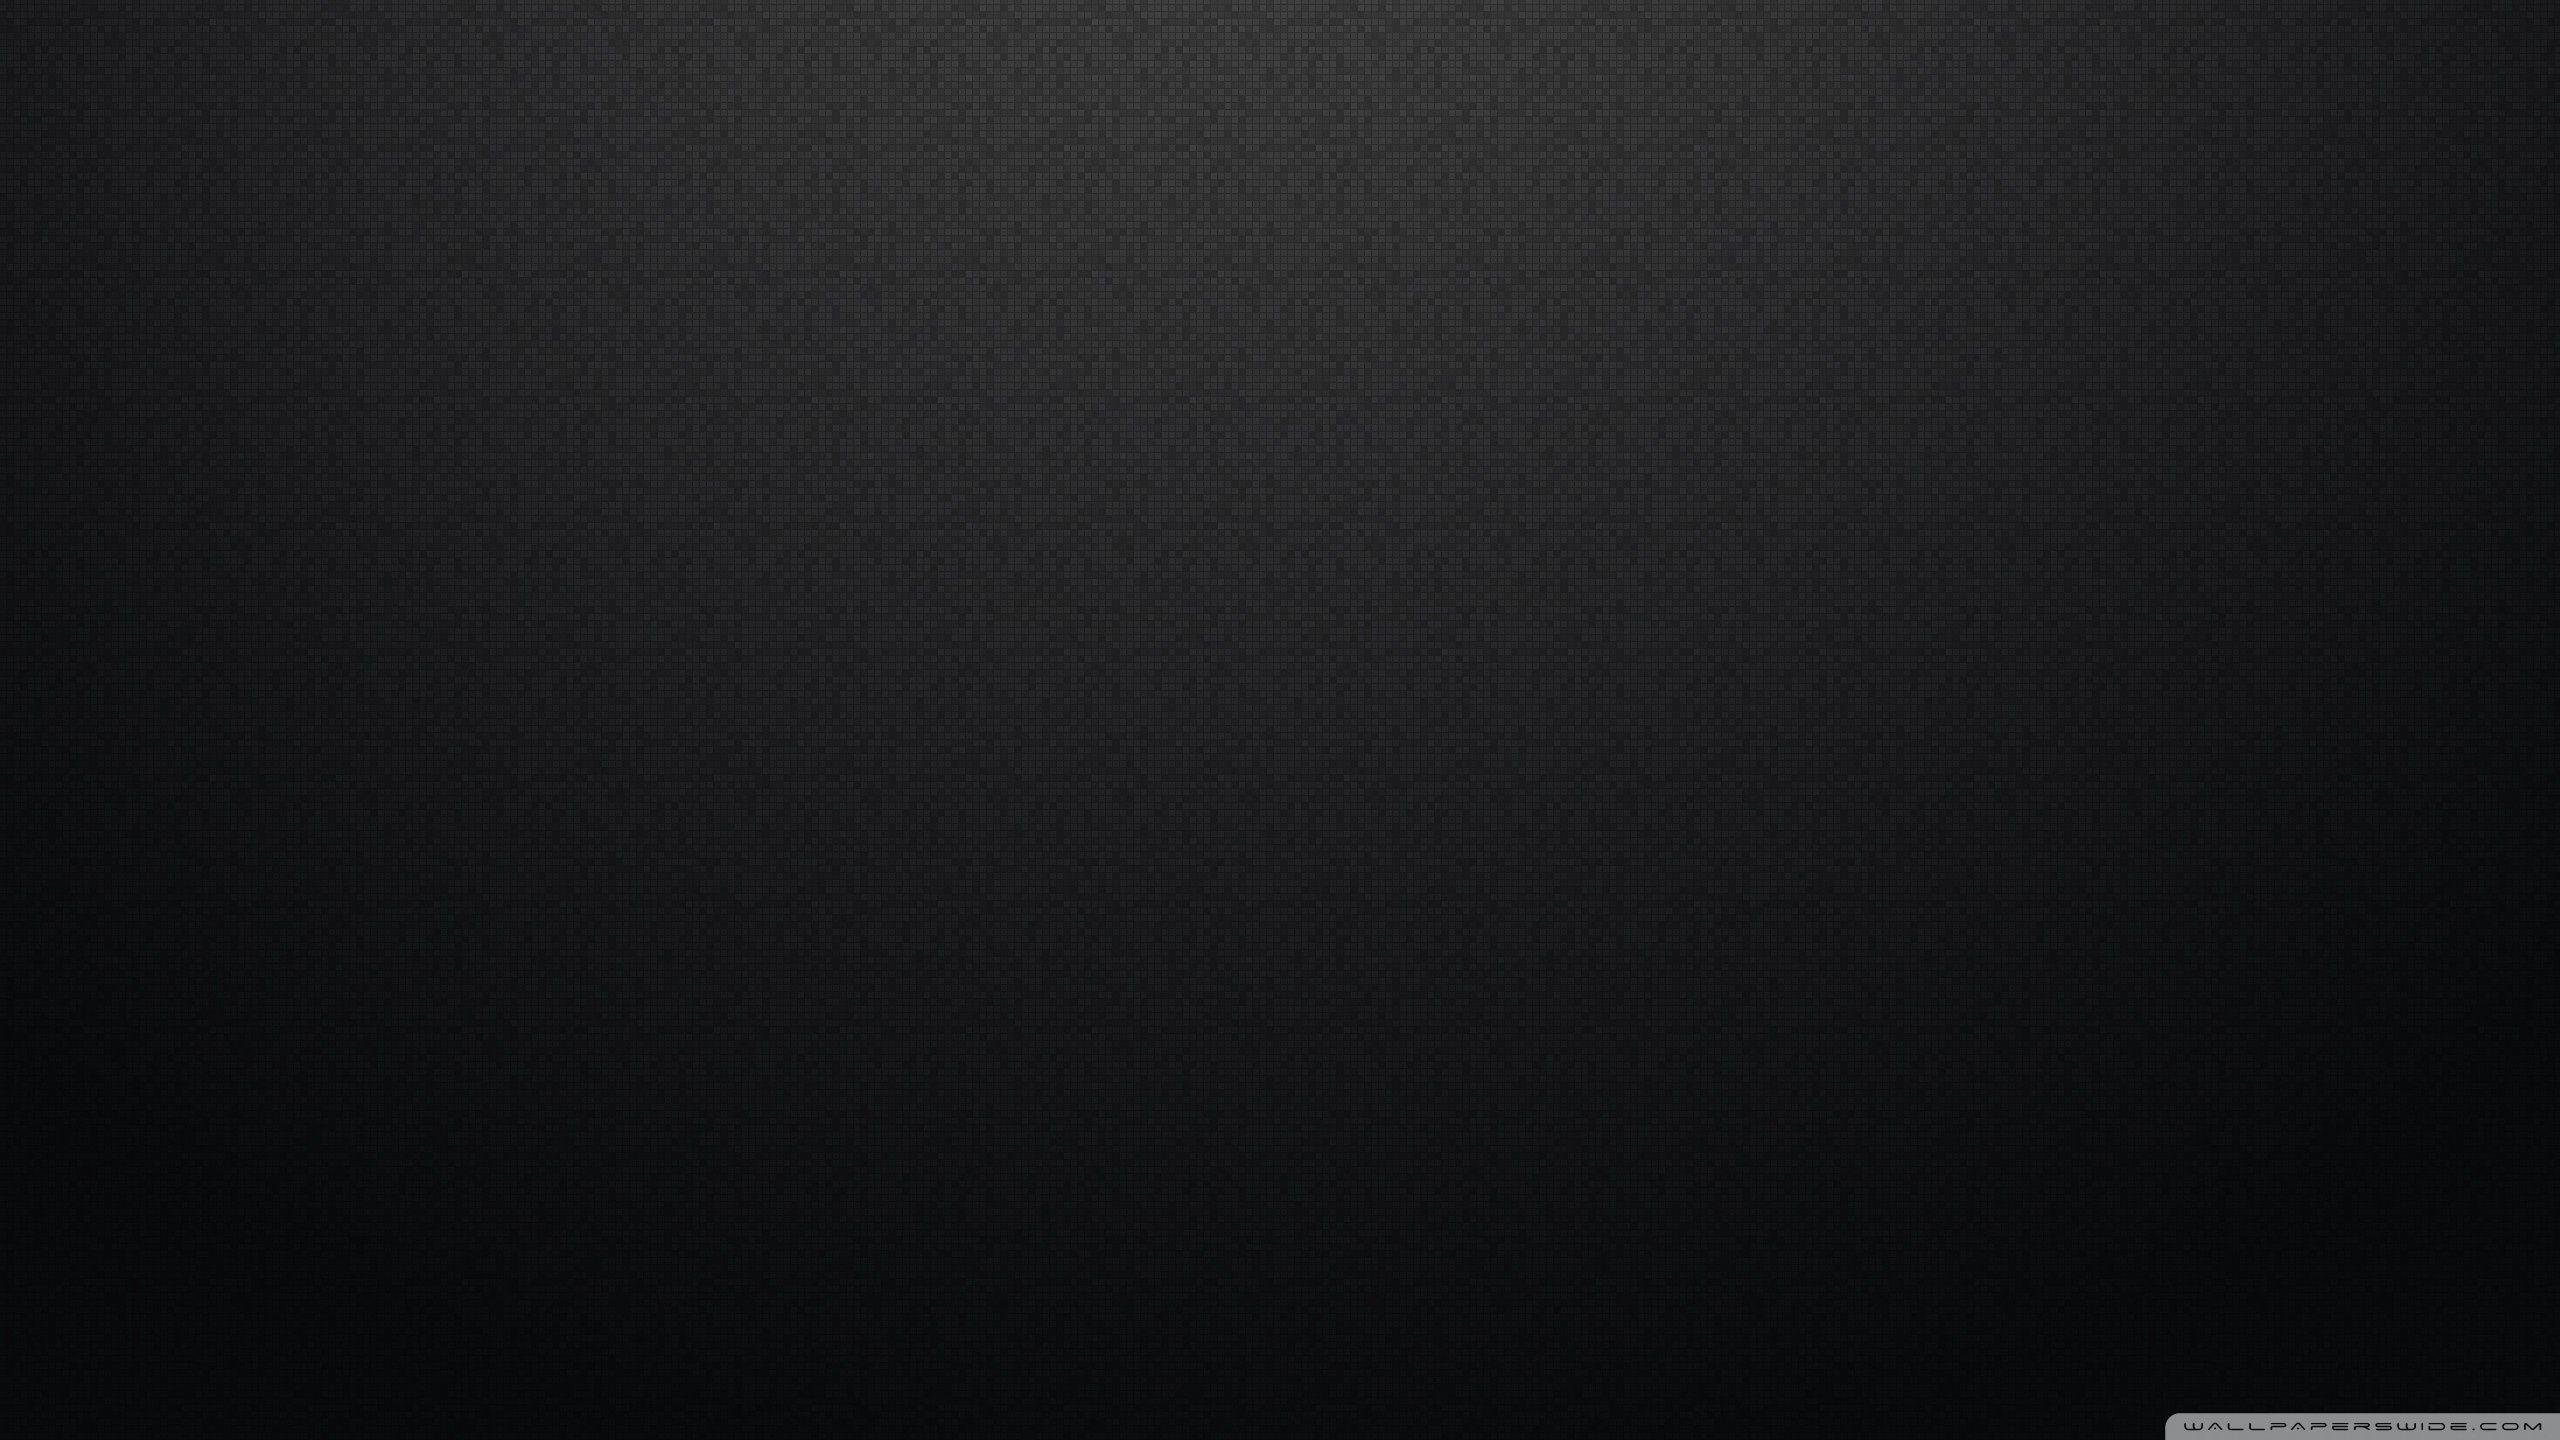 2560x1440 Black Wallpapers Top Free 2560x1440 Black